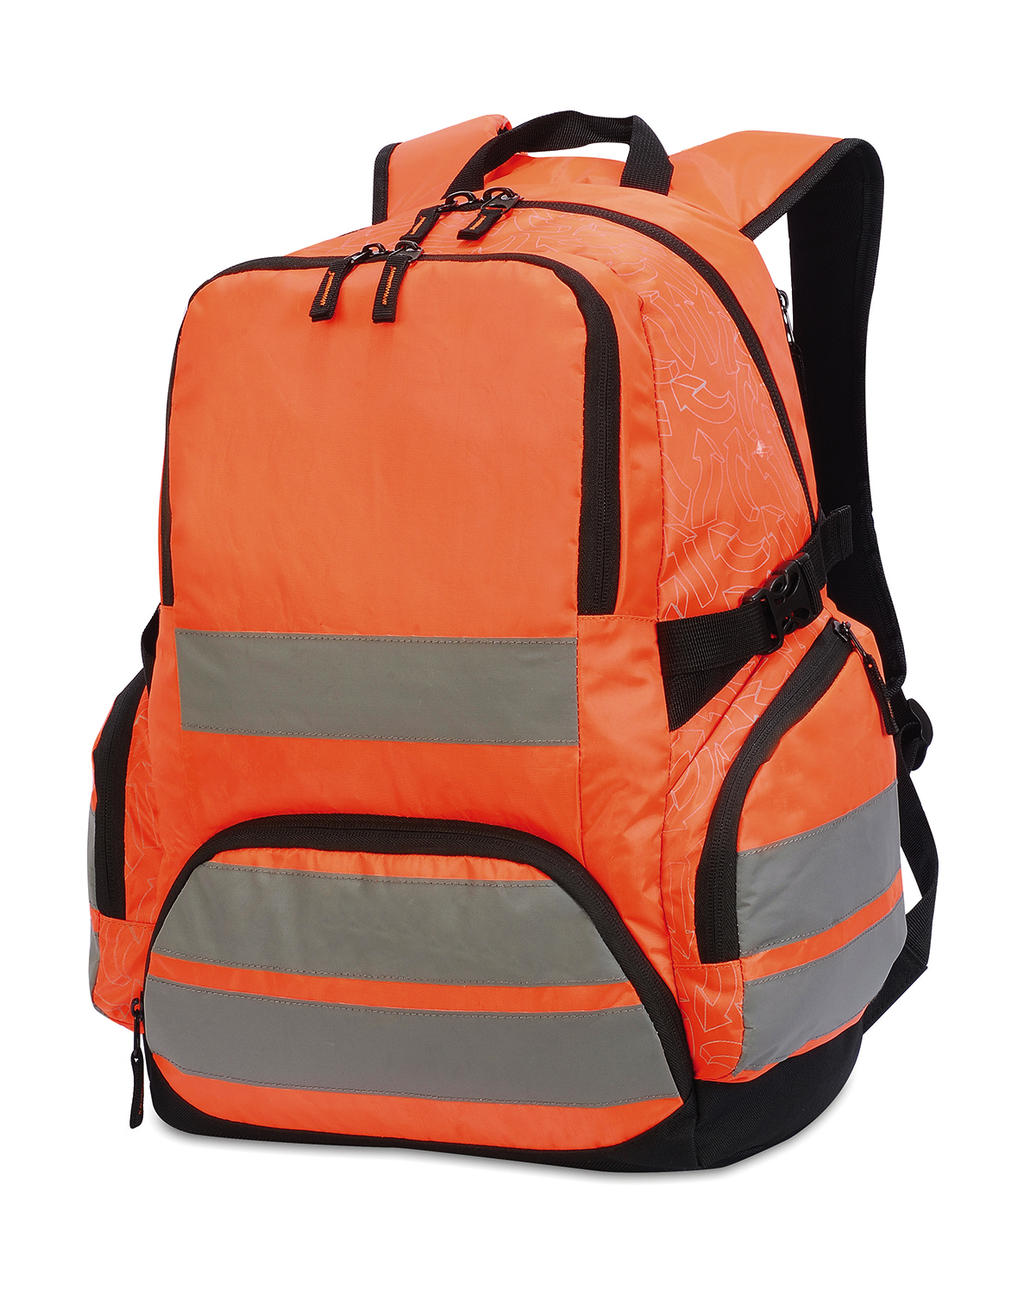 Batoh Backpack London  - zvìtšit obrázek